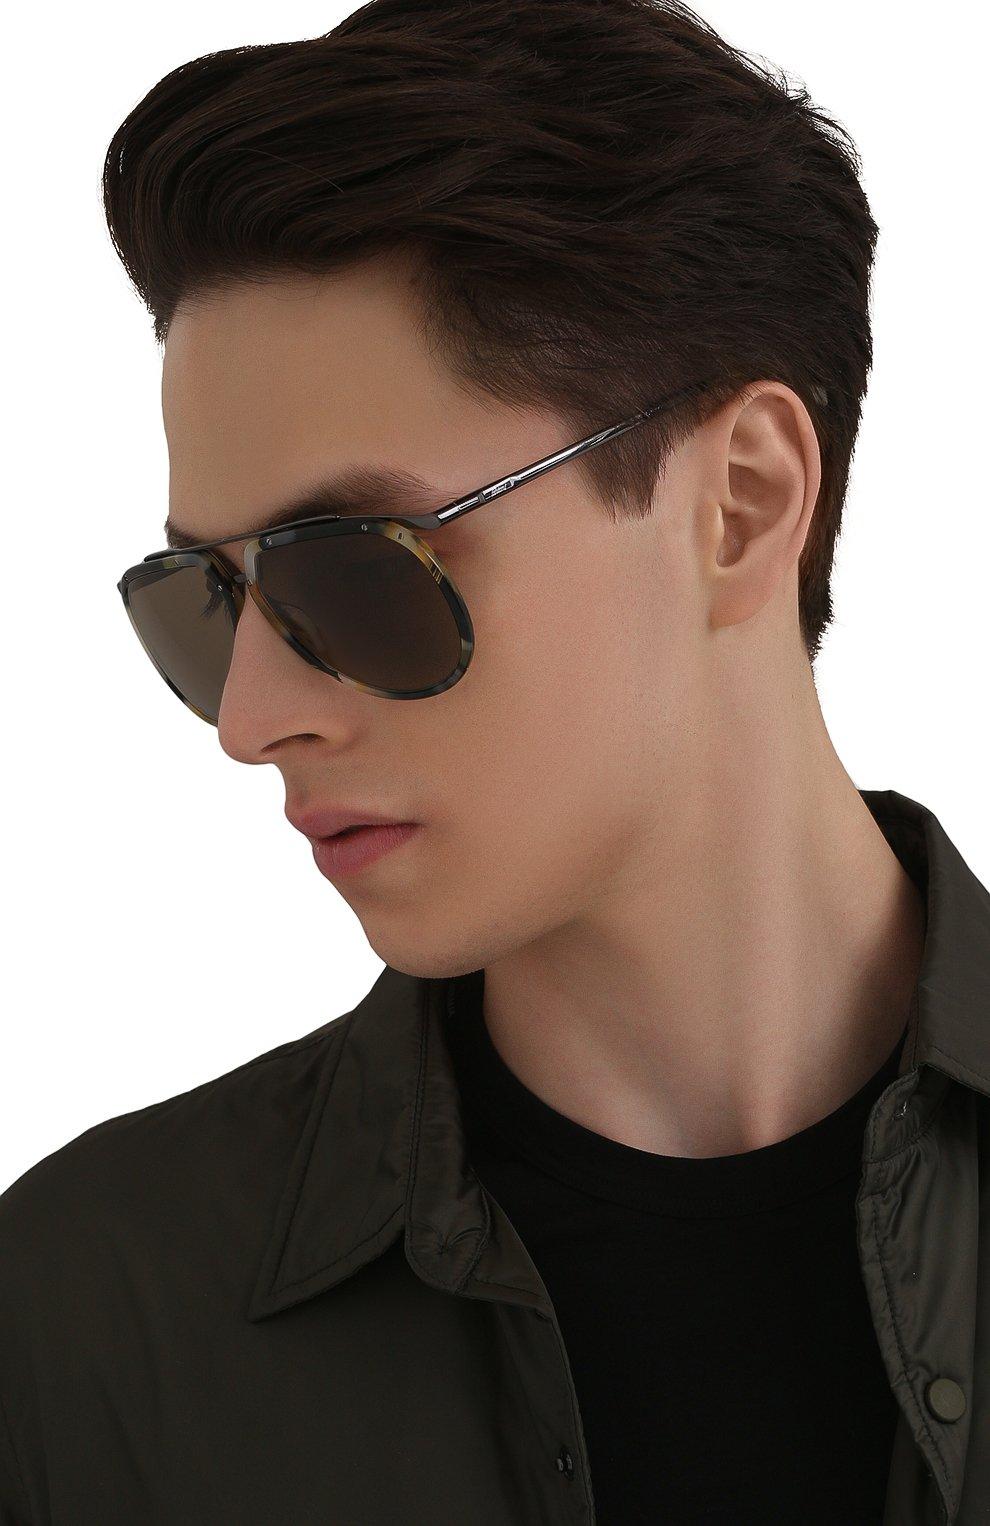 Мужские солнцезащитные очки BRIONI разноцветного цвета, арт. 0DC900/P3ZAC | Фото 2